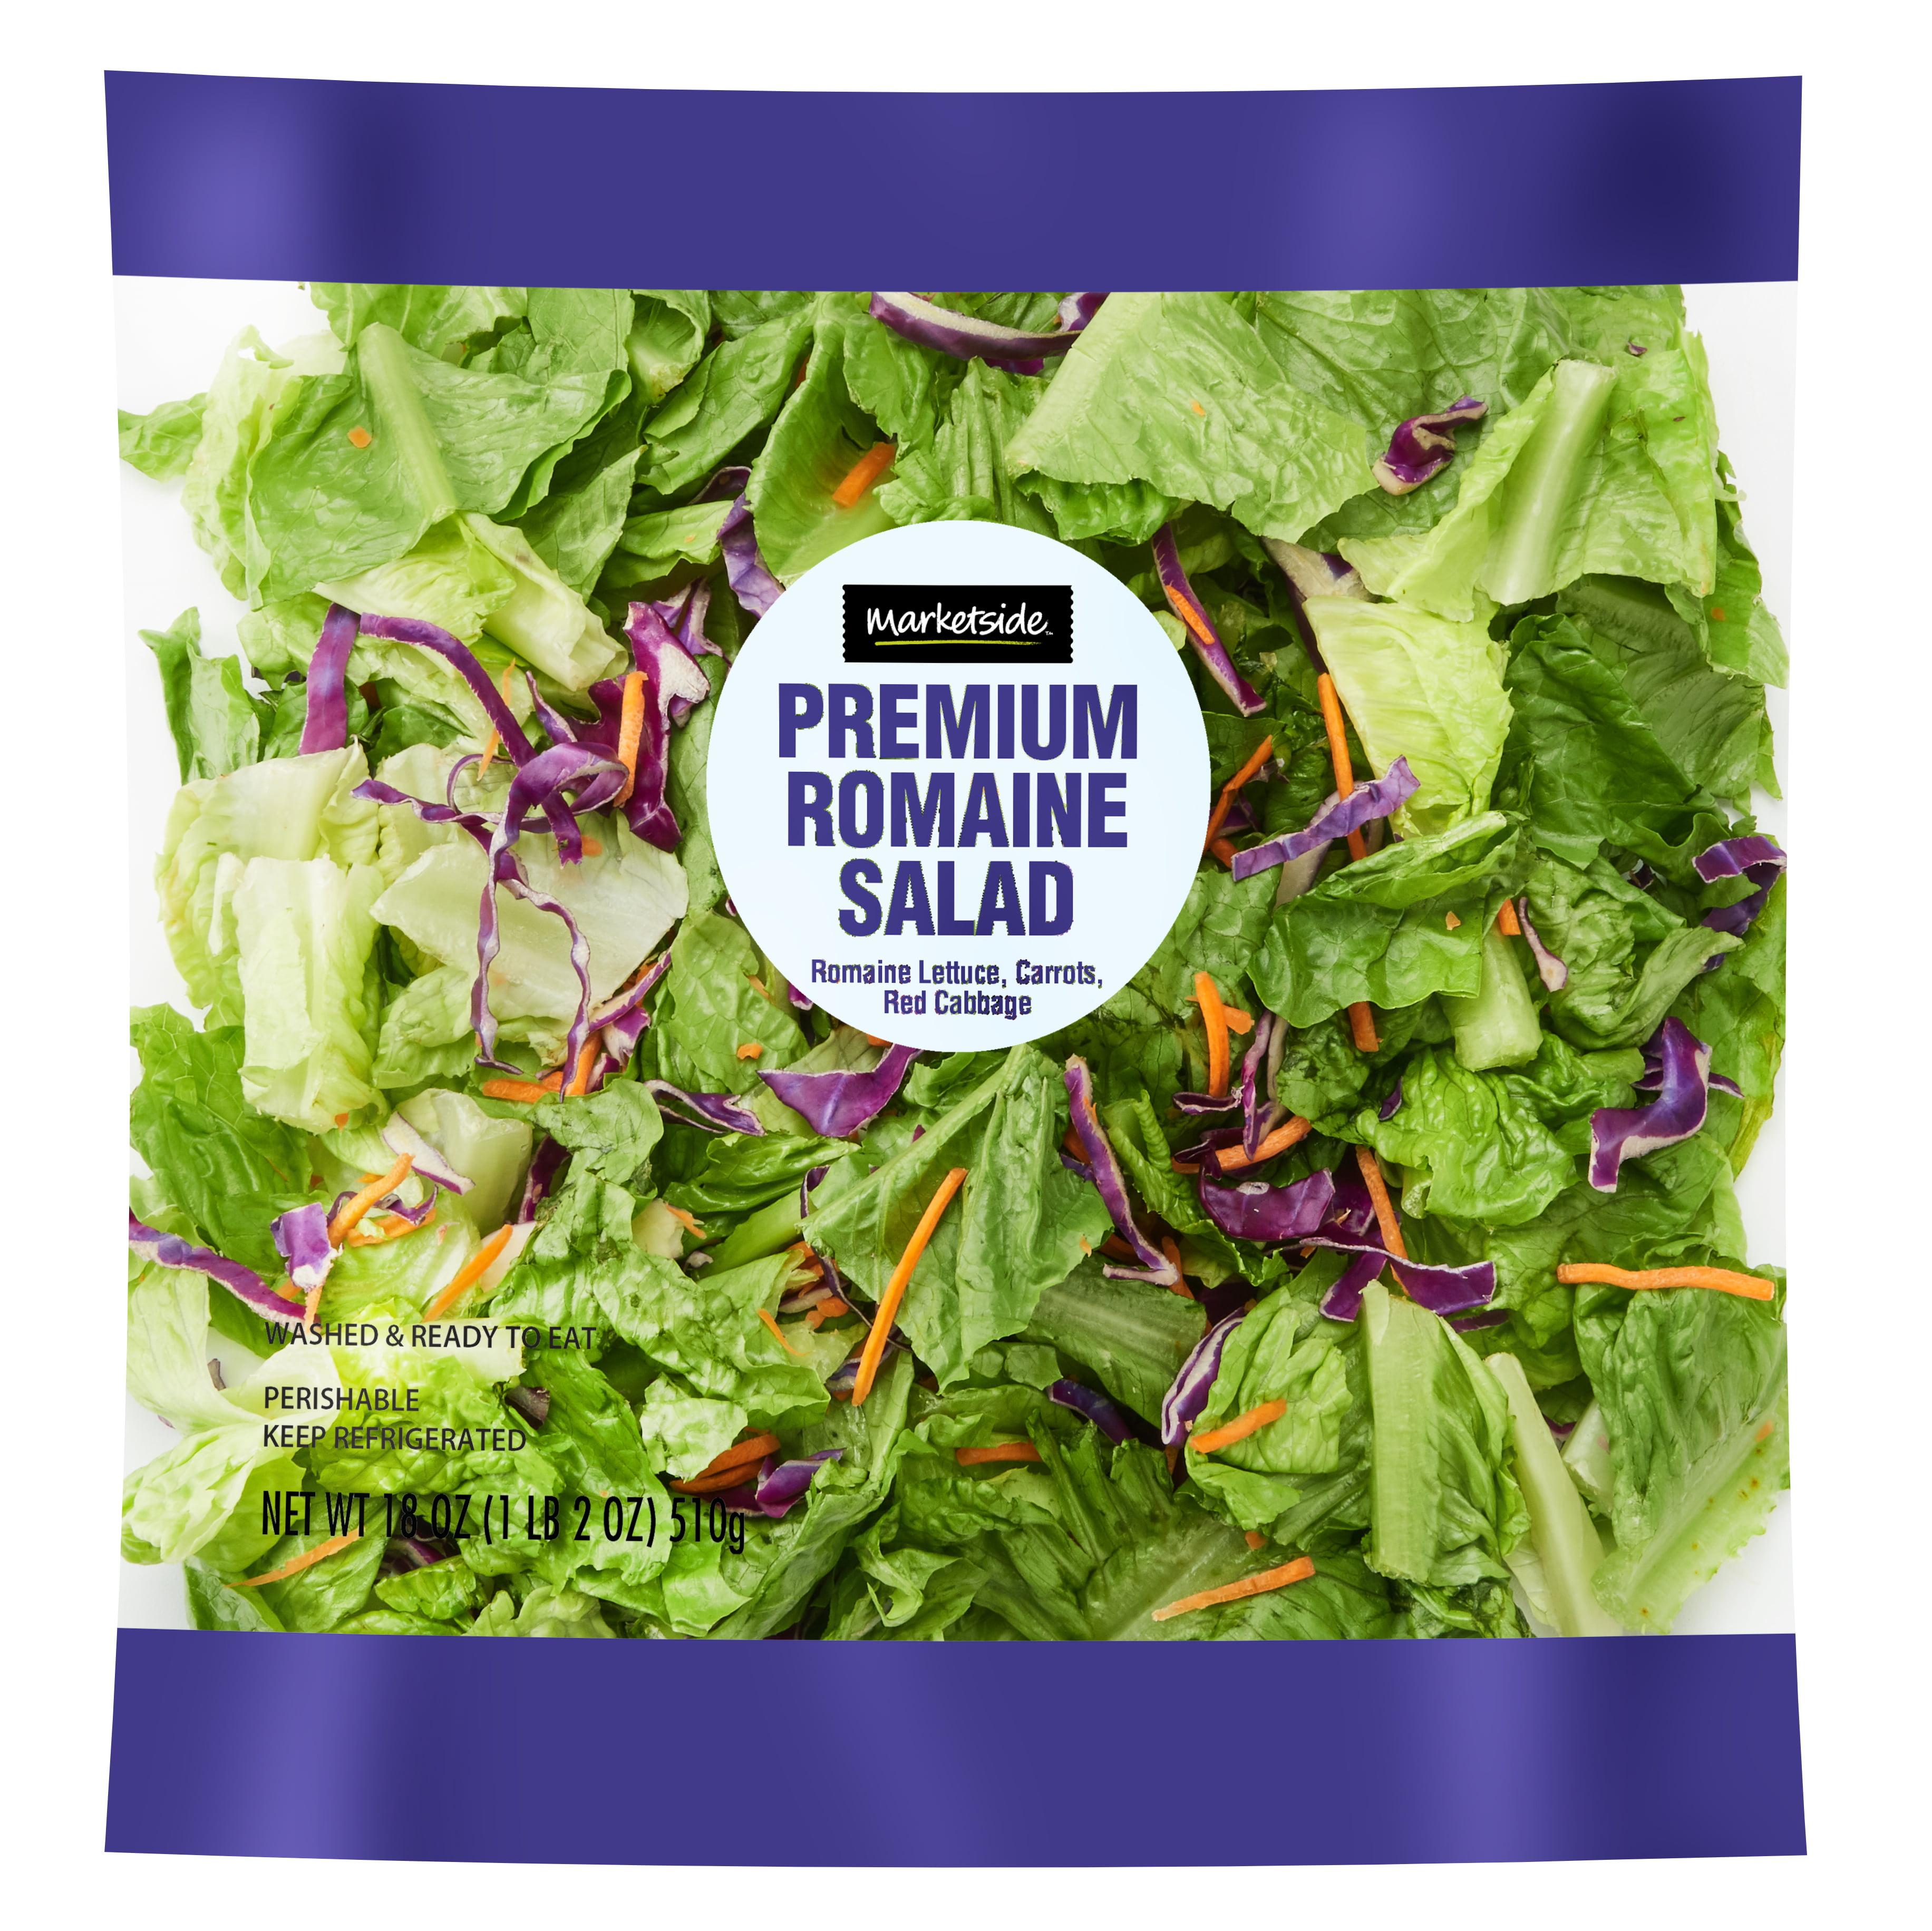 Marketside Premium Romaine Salad, 18 oz